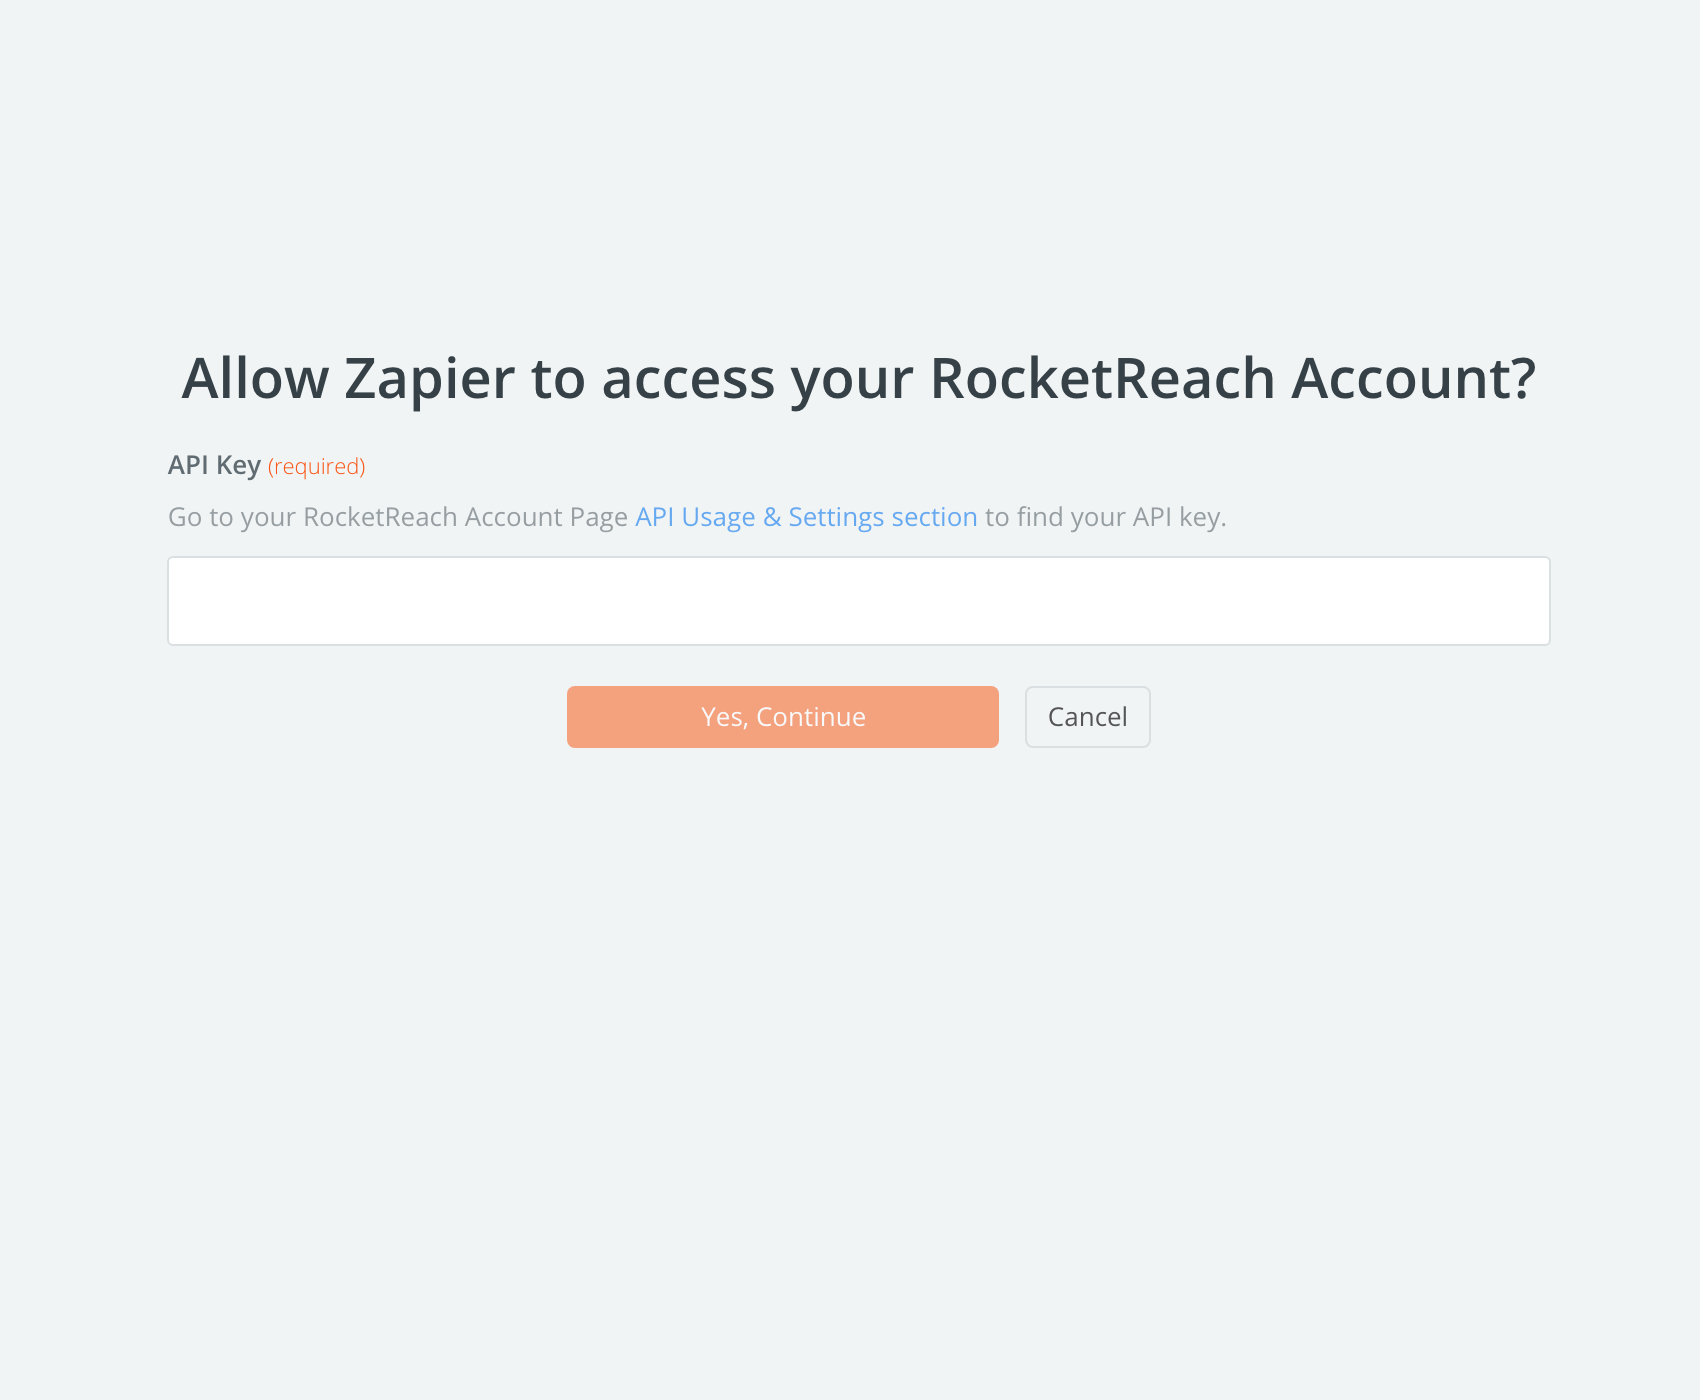 RocketReach API Key